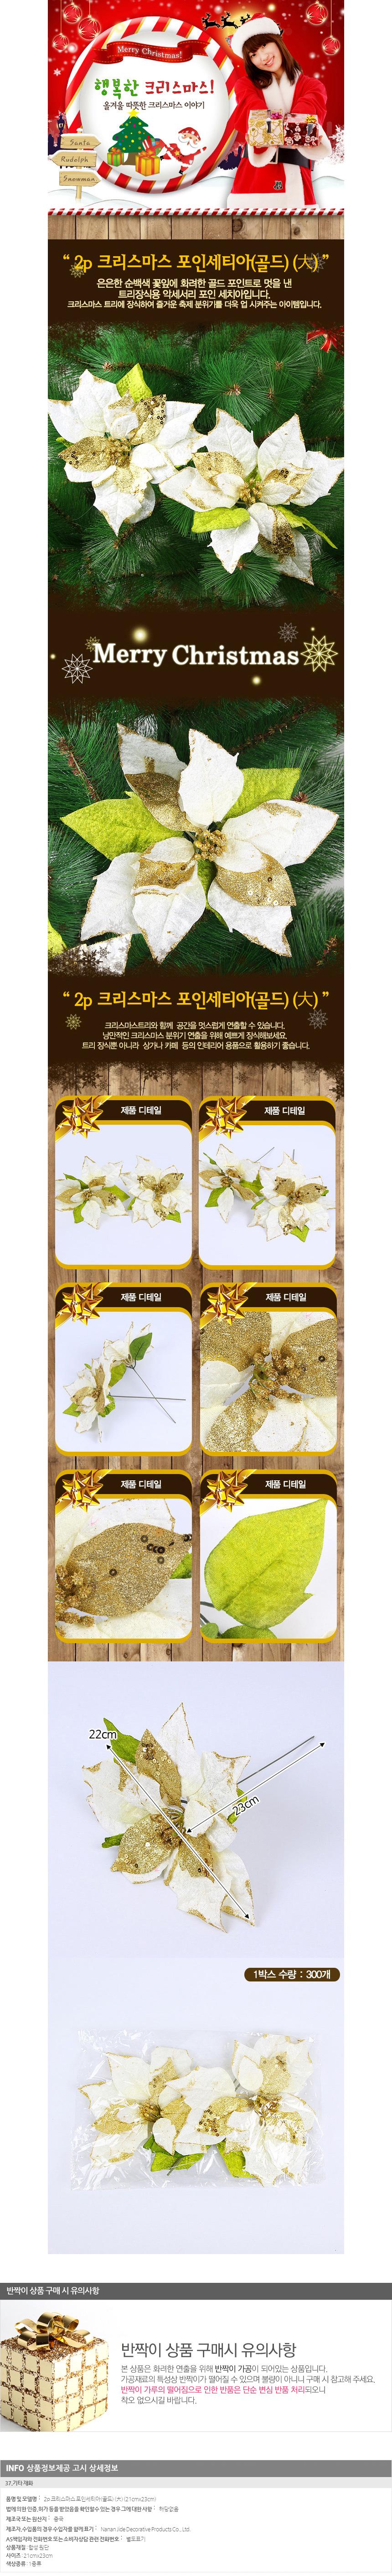 2p 크리스마스 포인세티아(화이트) (大) 꽃장식 - 기프트갓, 2,960원, 장식품, 크리스마스소품